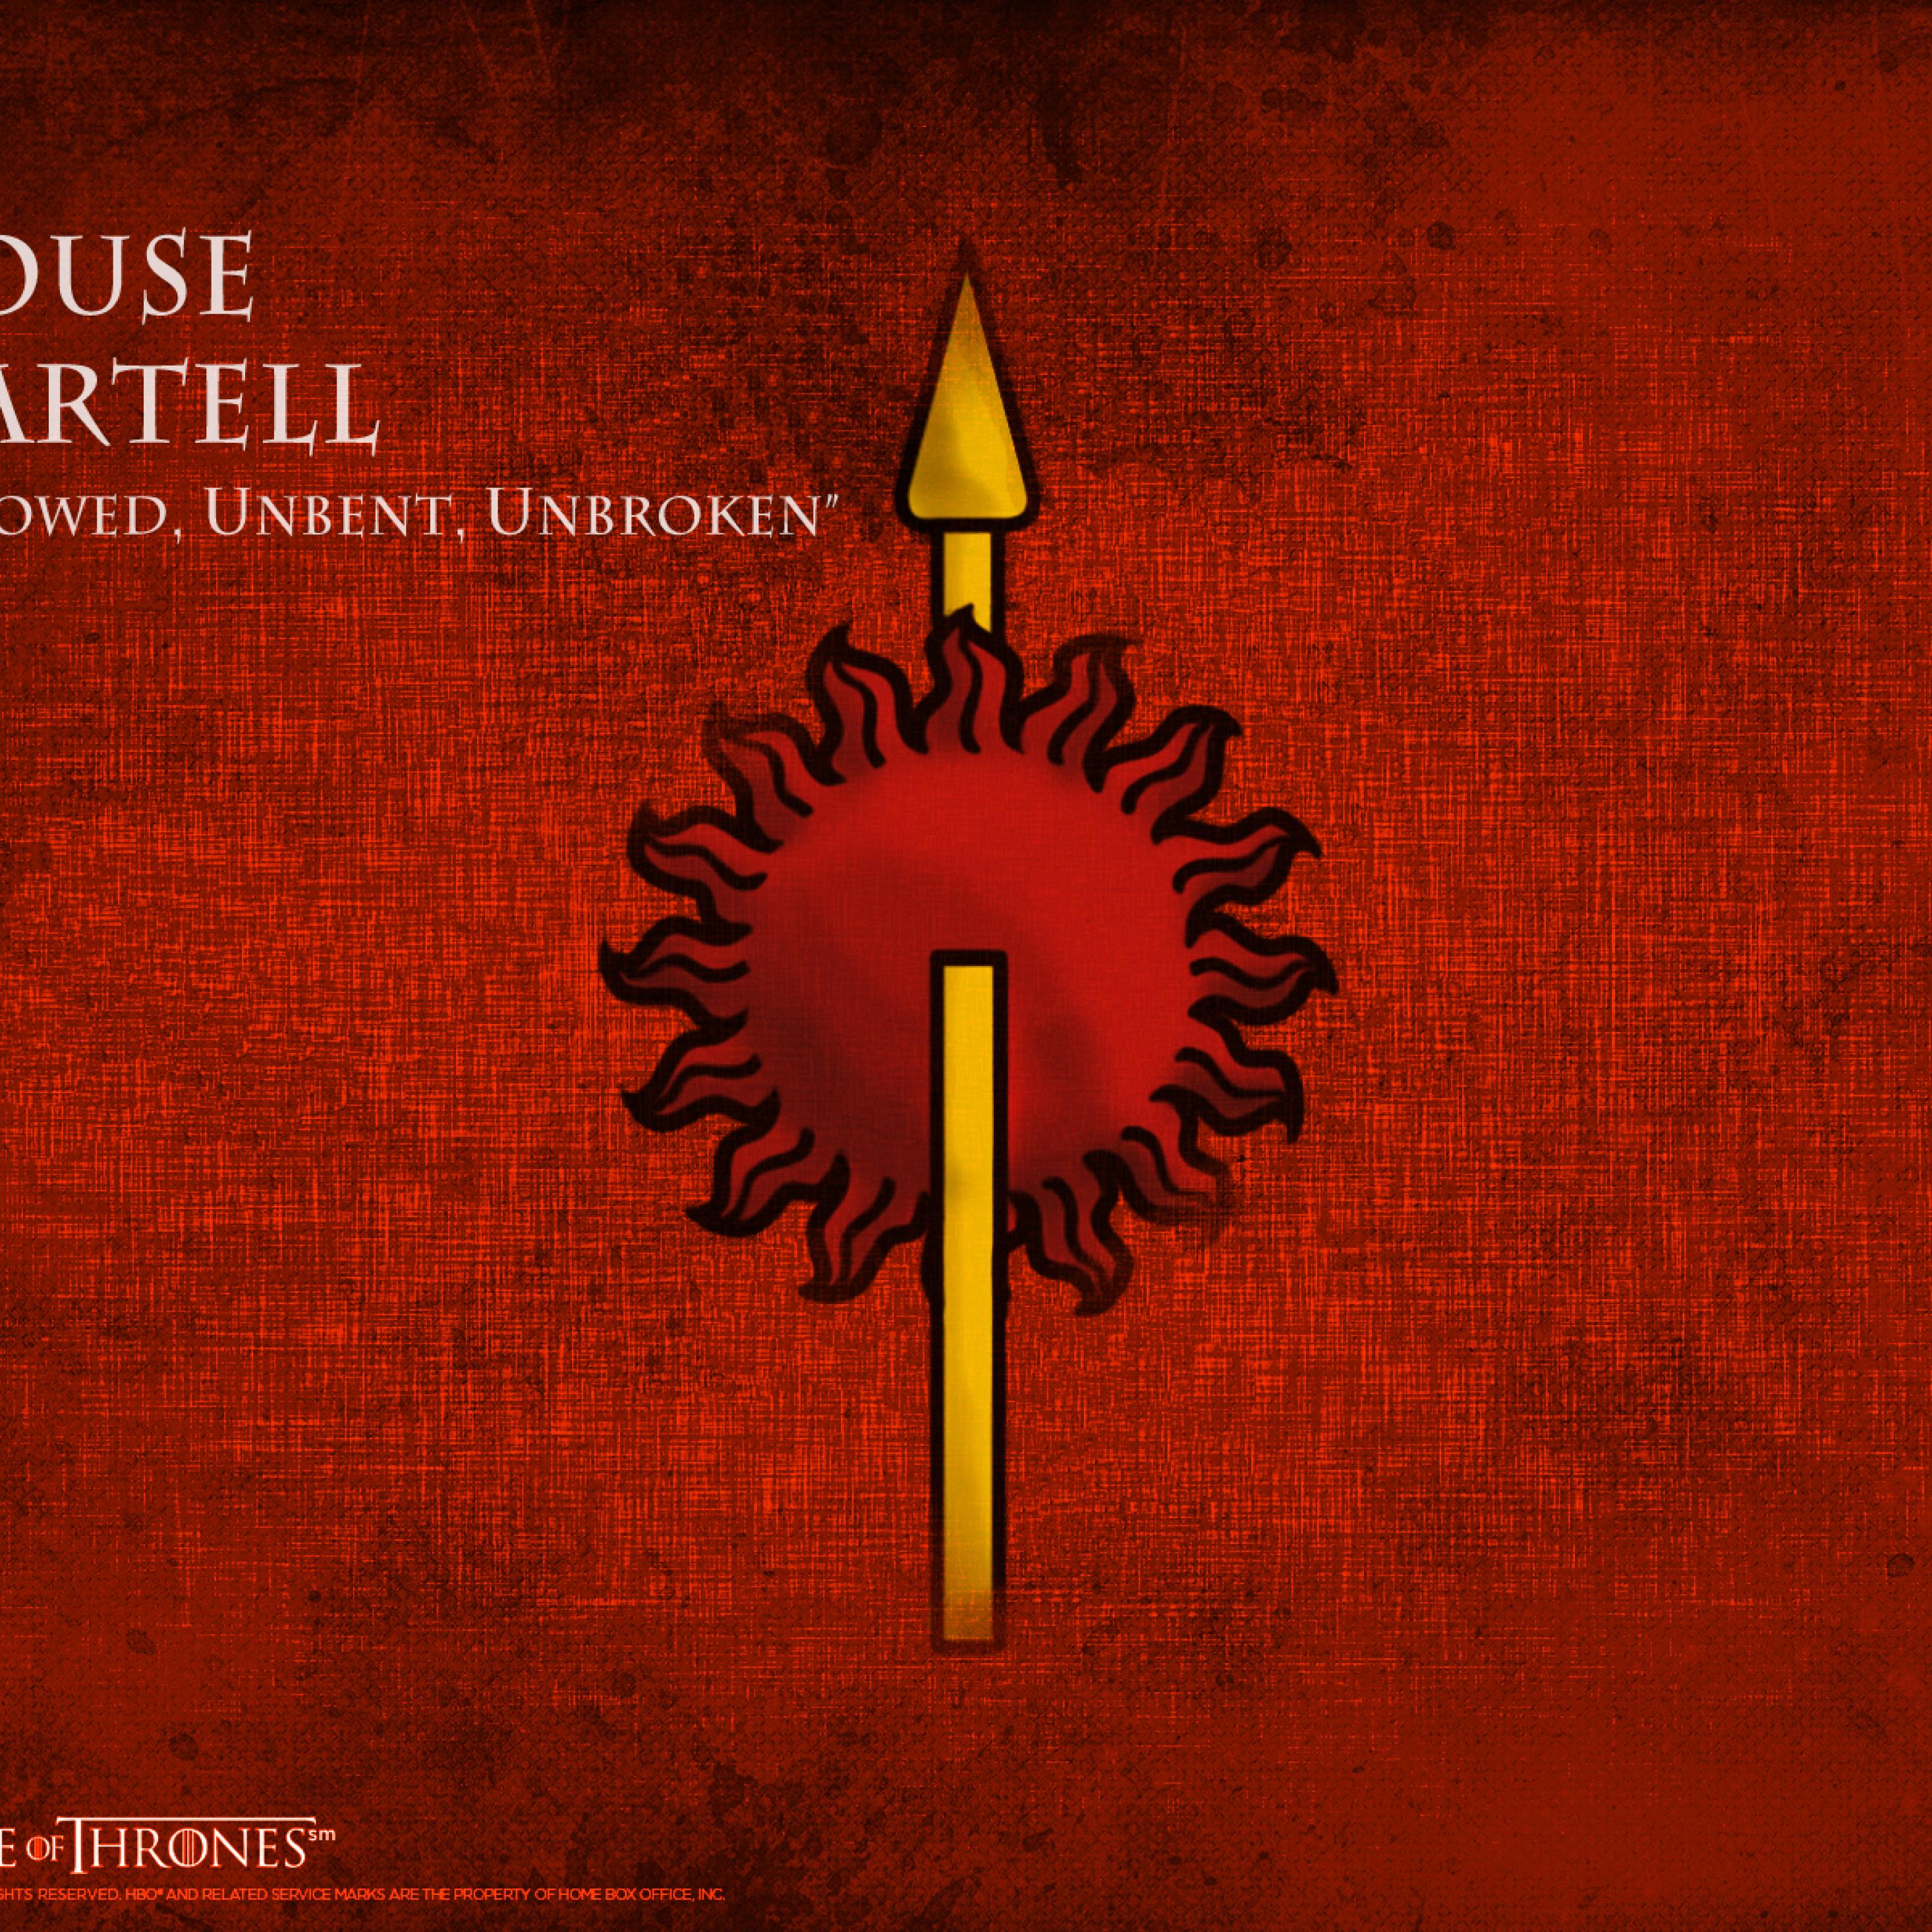 2932x2932 Game Of Thrones House Martell Ipad Pro Retina Display